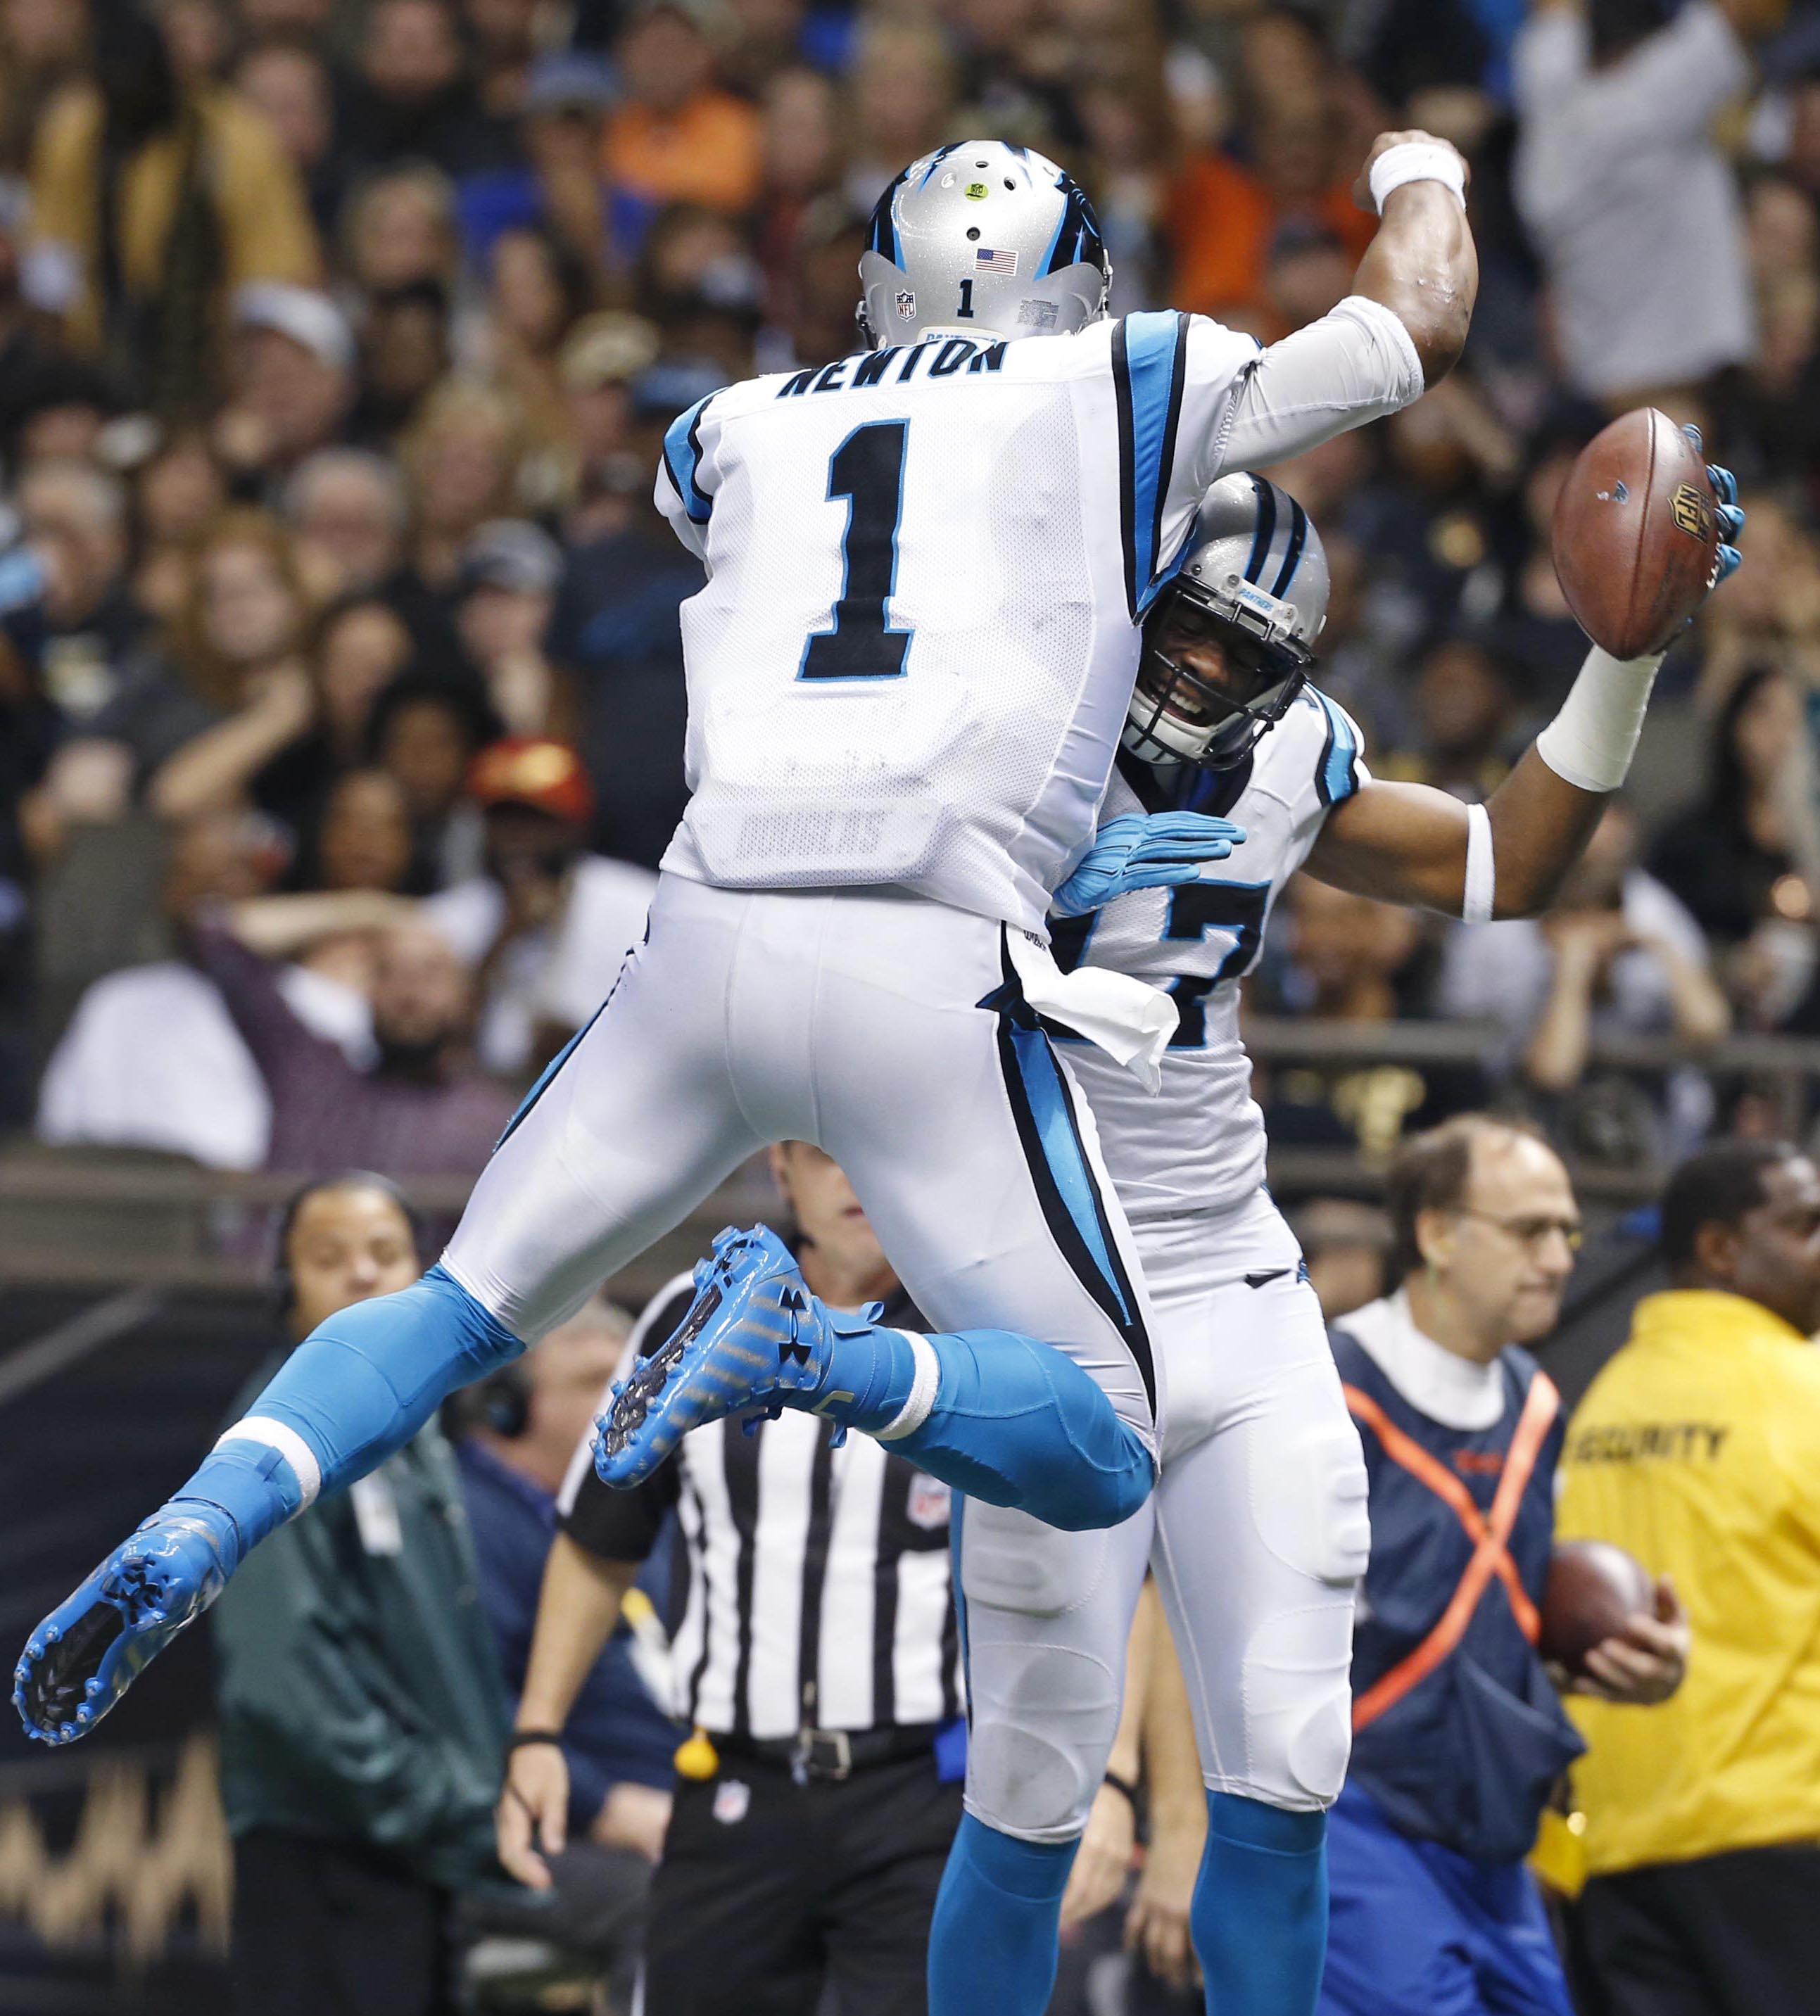 Amar A Muerte Capitulo 12: Panthers 41-38 Saints: SuperCAM Y Carolina Llegan A 12